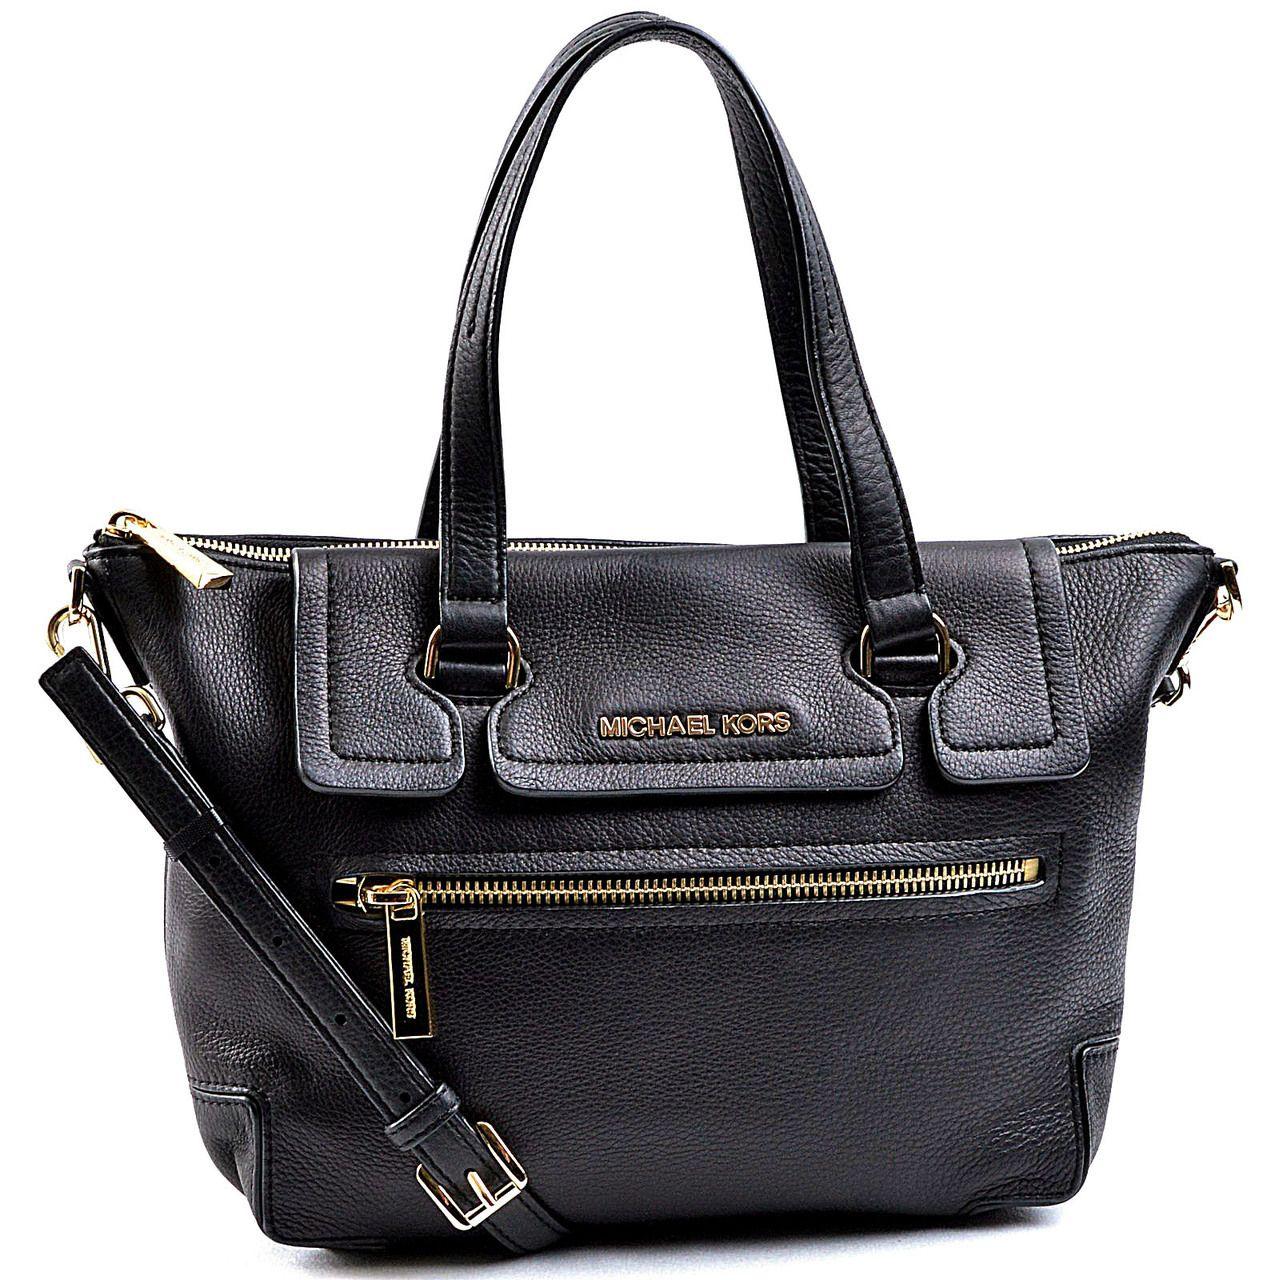 Designer Handbags Rescue Michael Kors Mackenzie Medium Satchel In Black